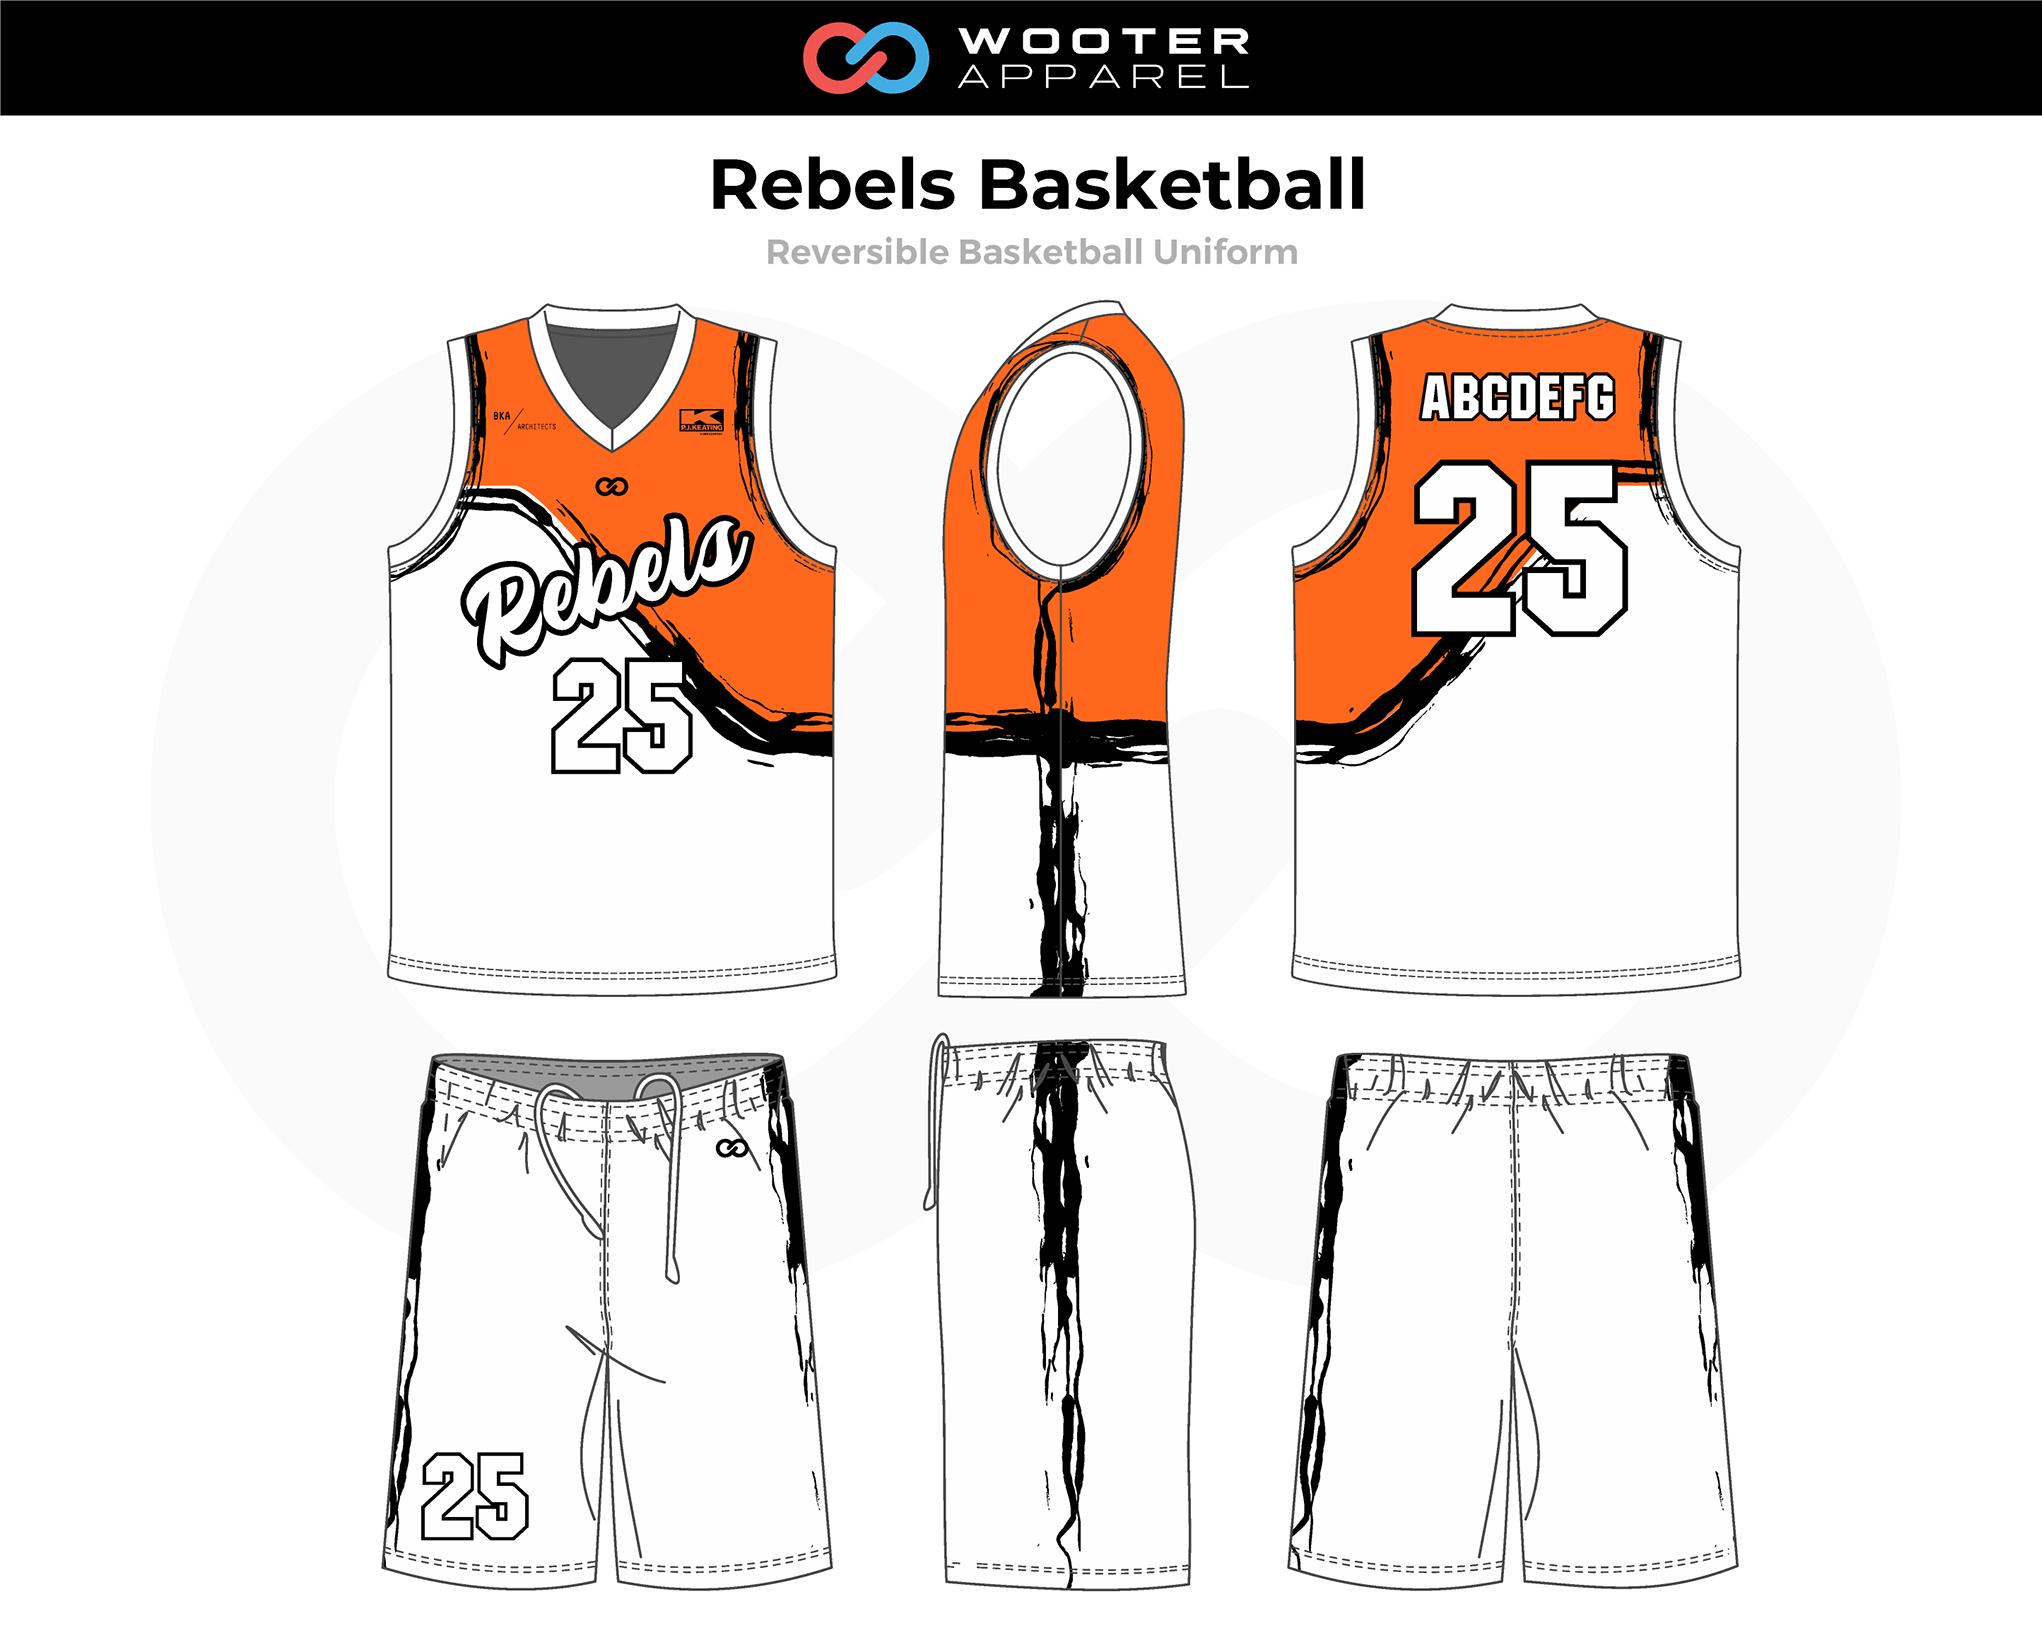 REBELS Orange White Black Reversible Basketball Uniform, Jersey and Shorts